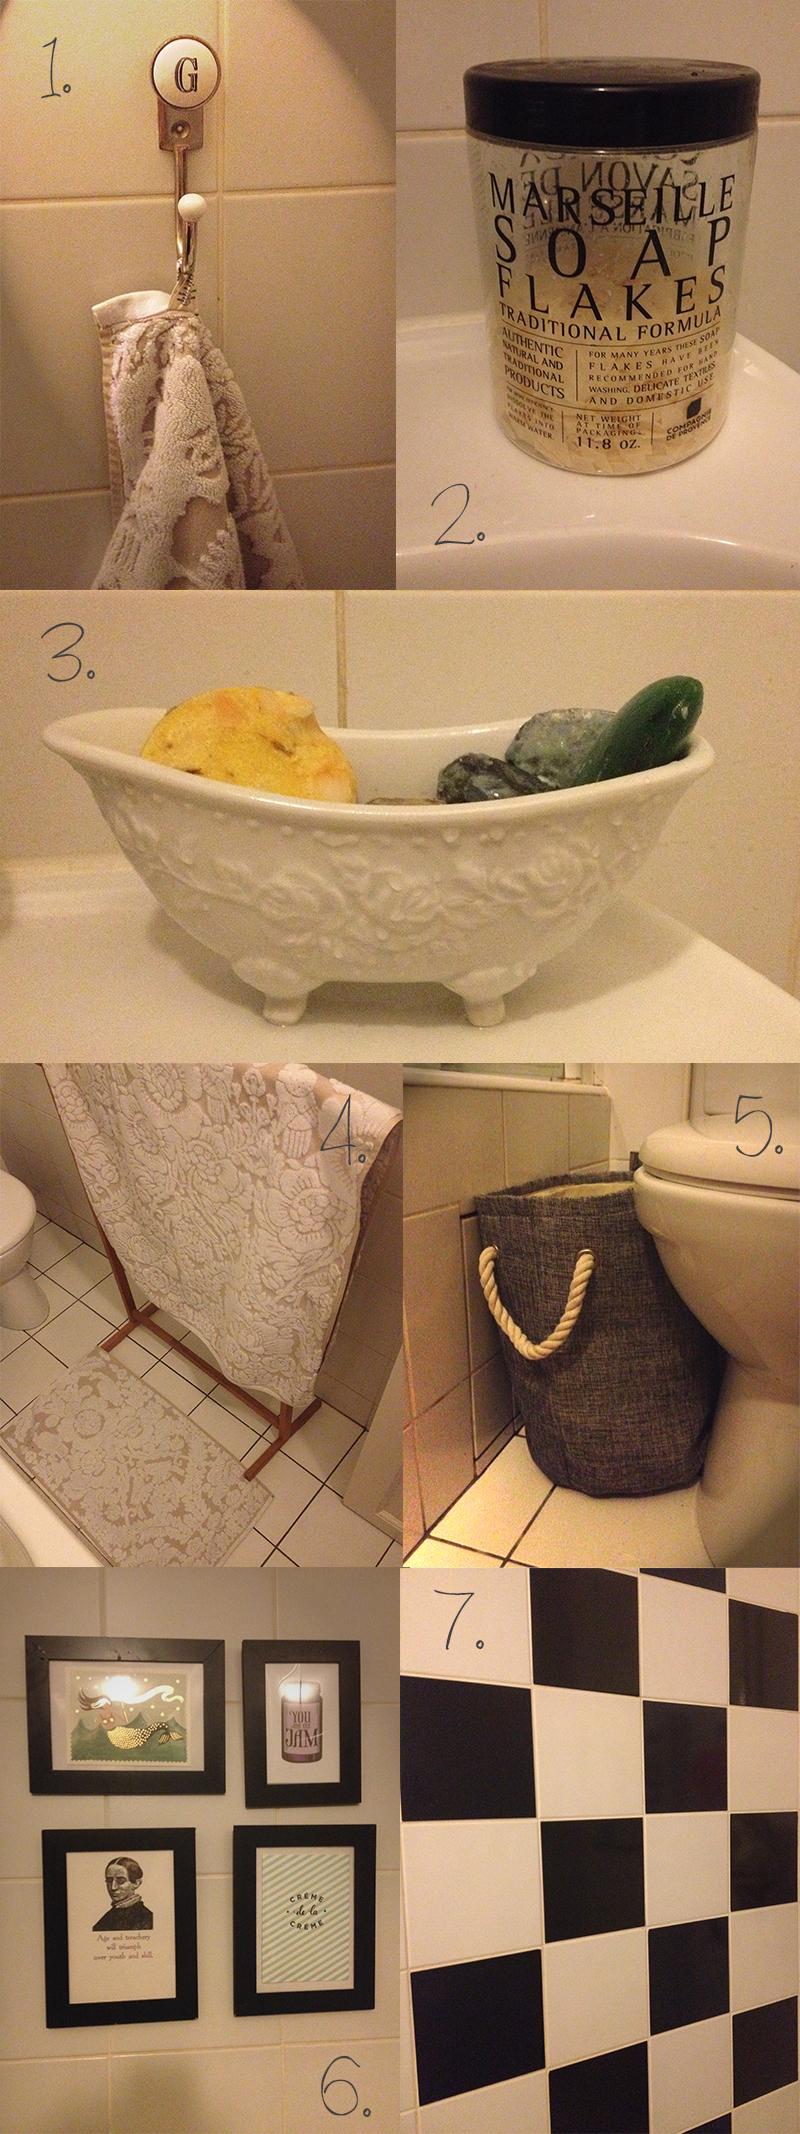 7 astuces pour d corer sa salle de bain chez vivianne - Decorer sa salle de bain ...